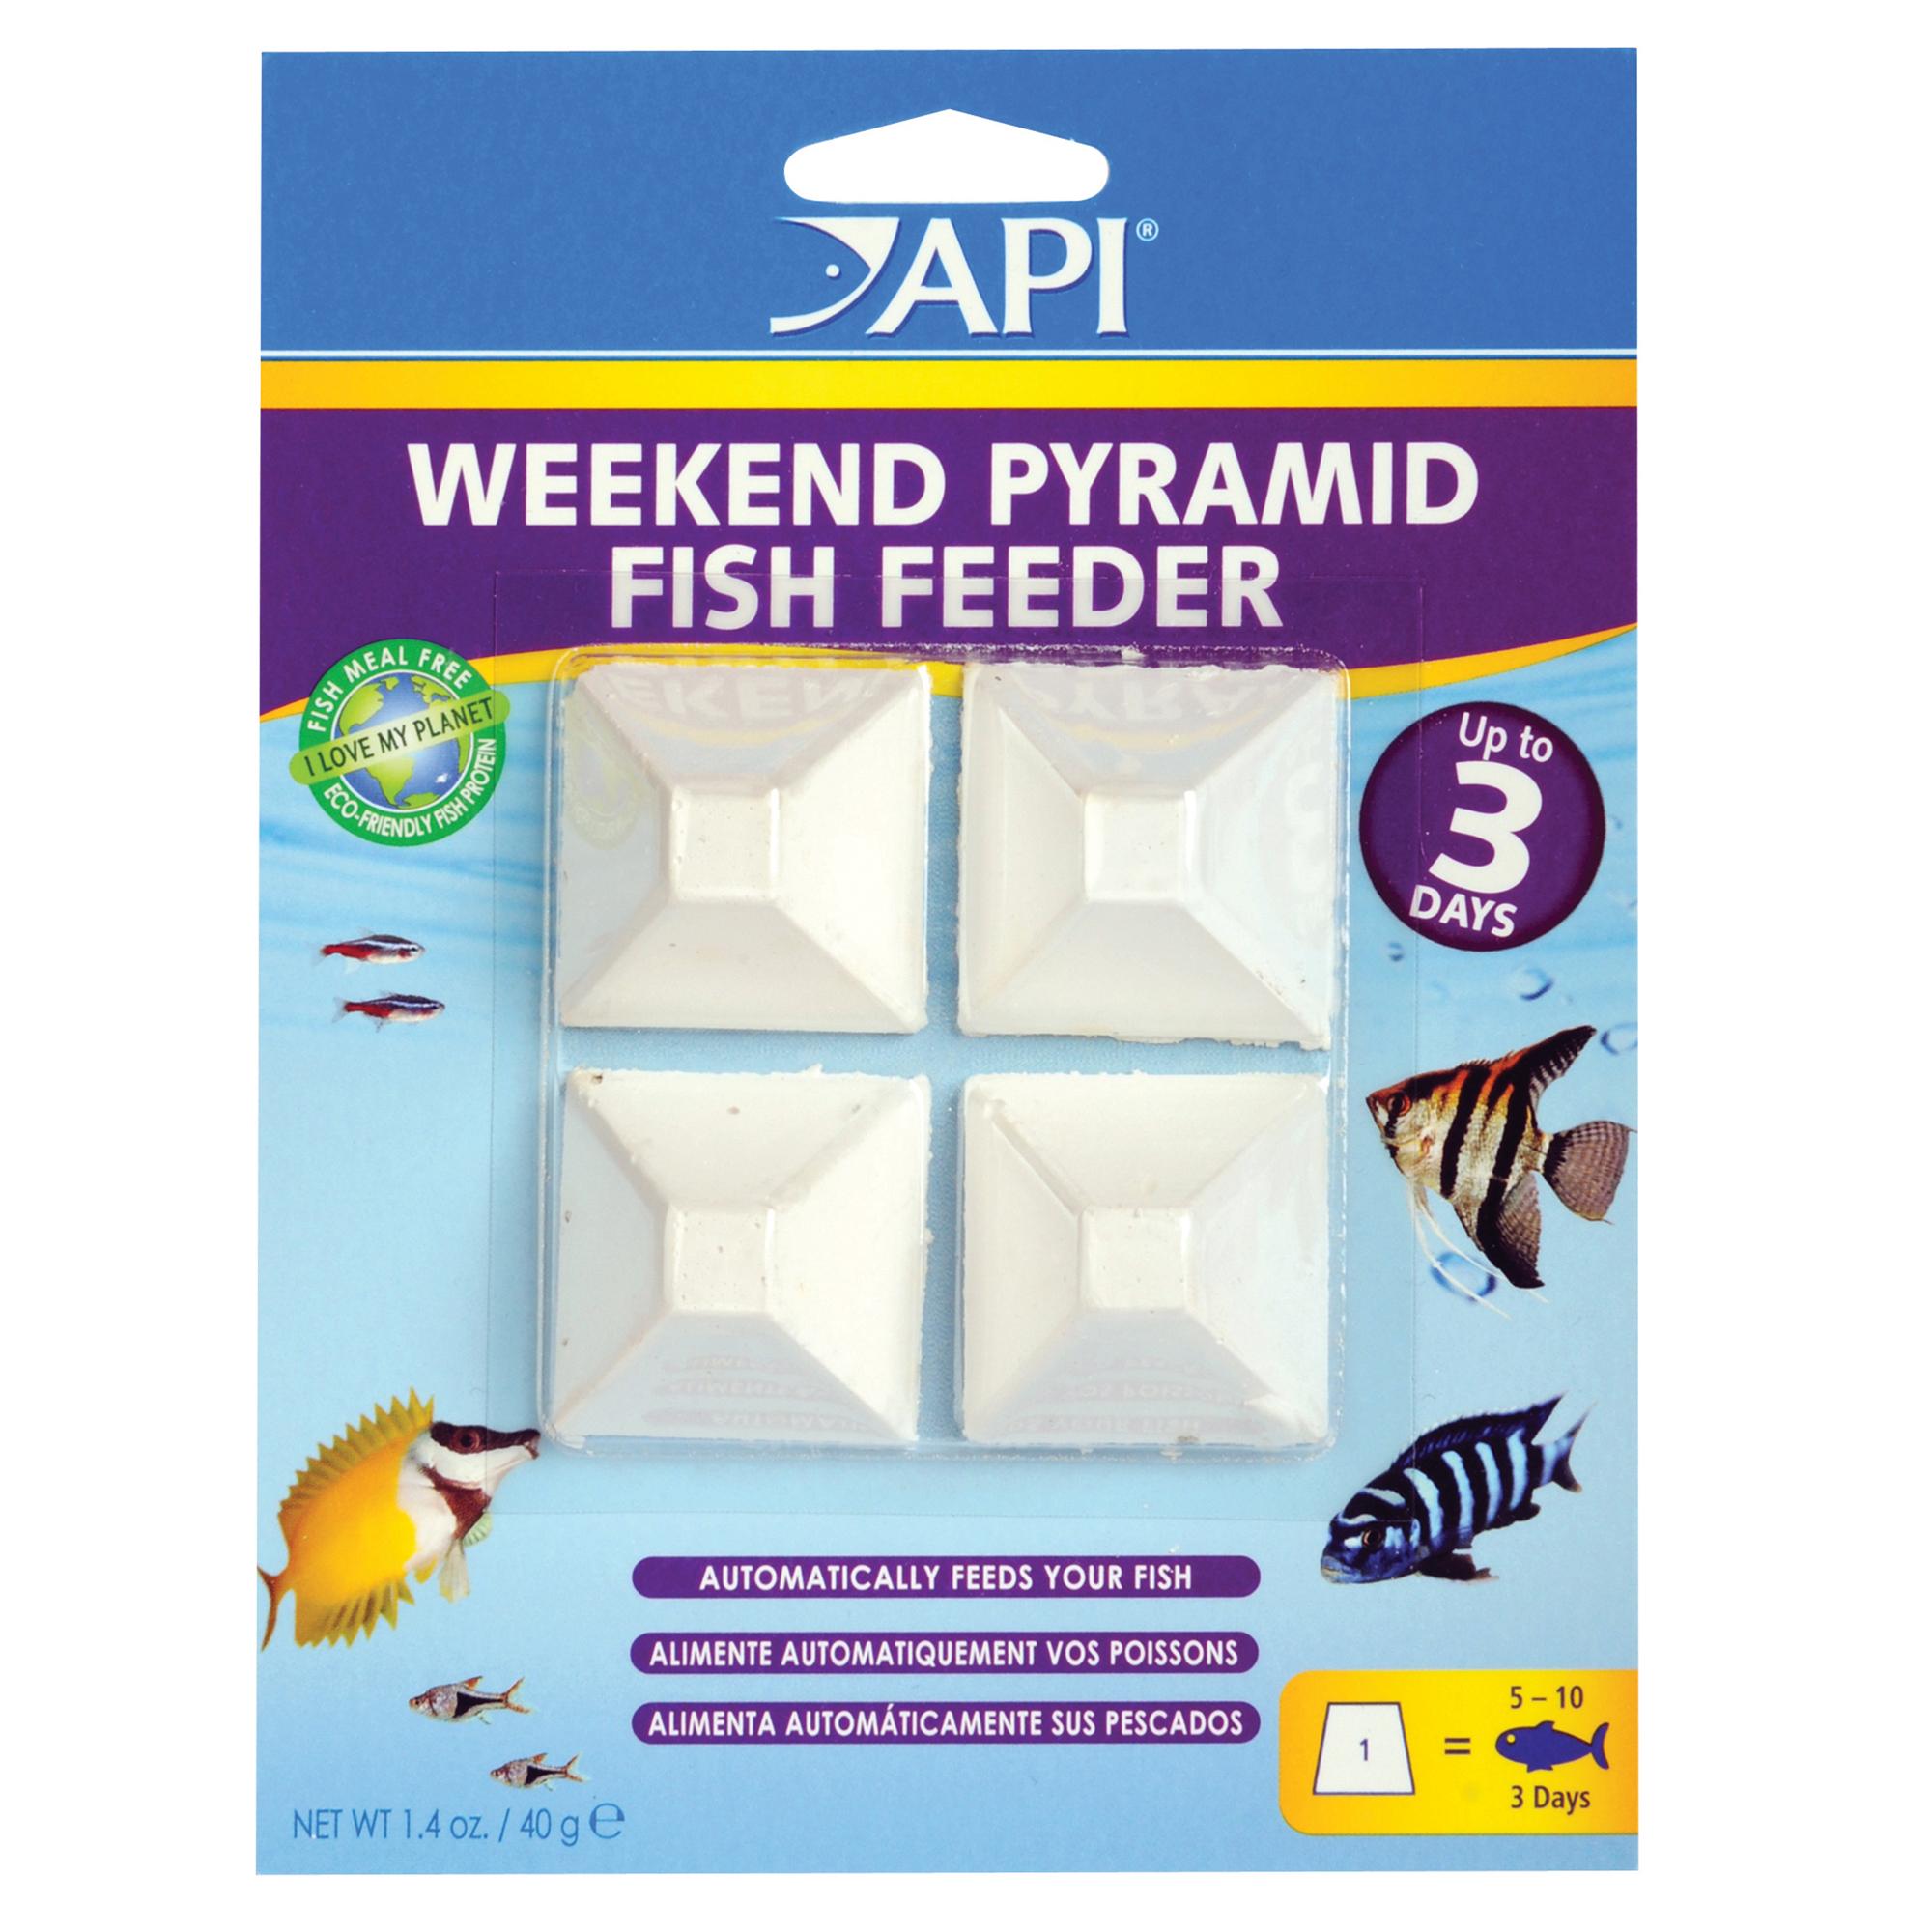 WEEKEND PYRAMID FISH FEEDER